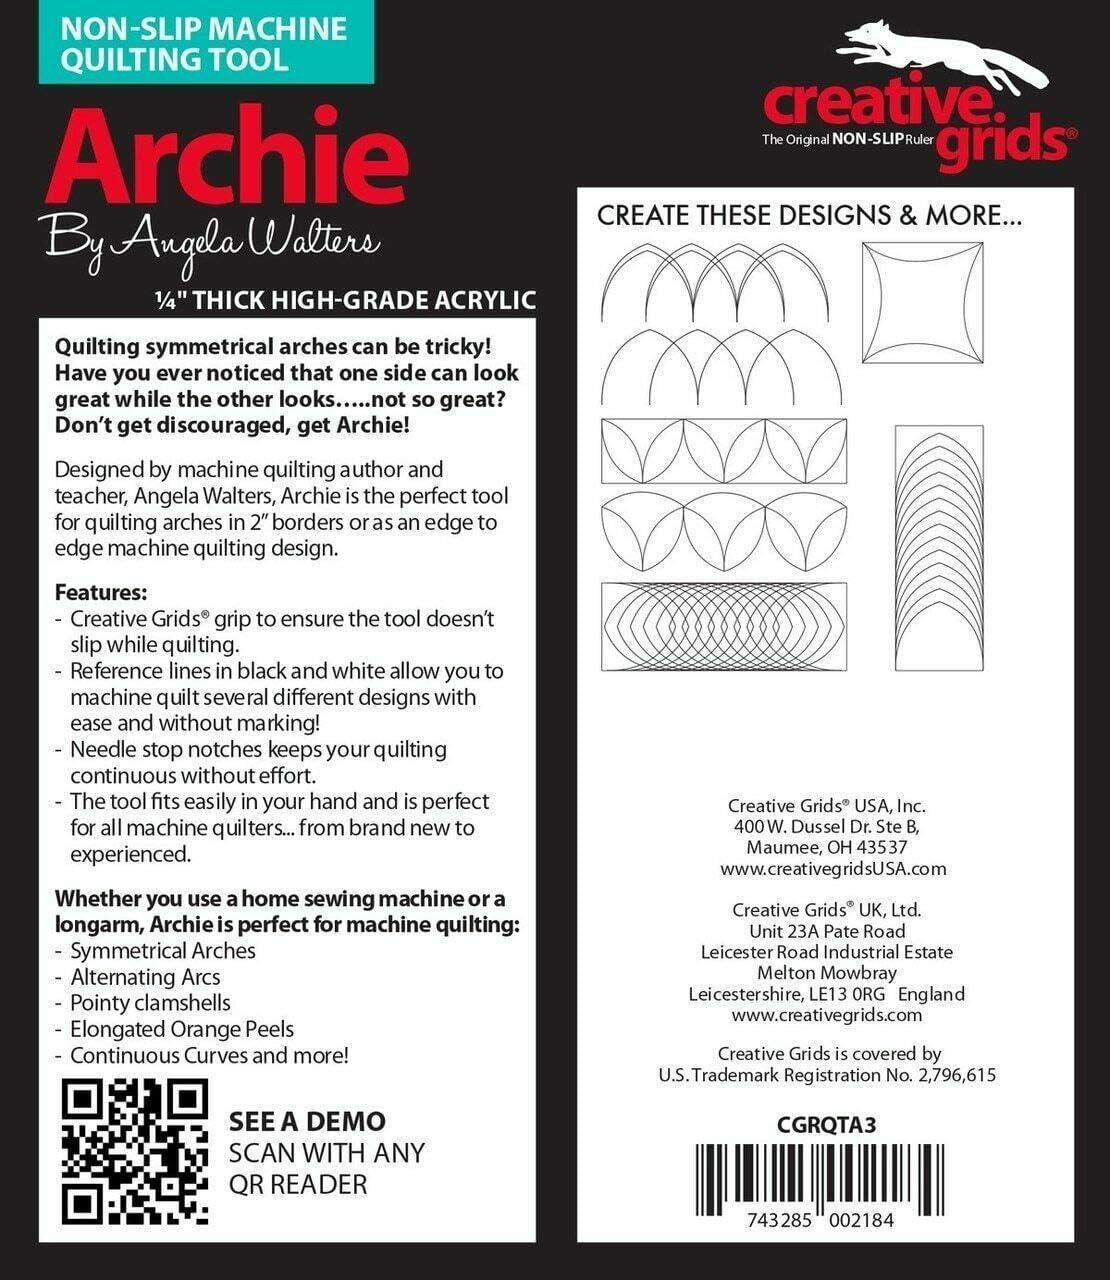 Creative Grids Machine Quilting Tool Ruler Template - Archie CGRQTA3